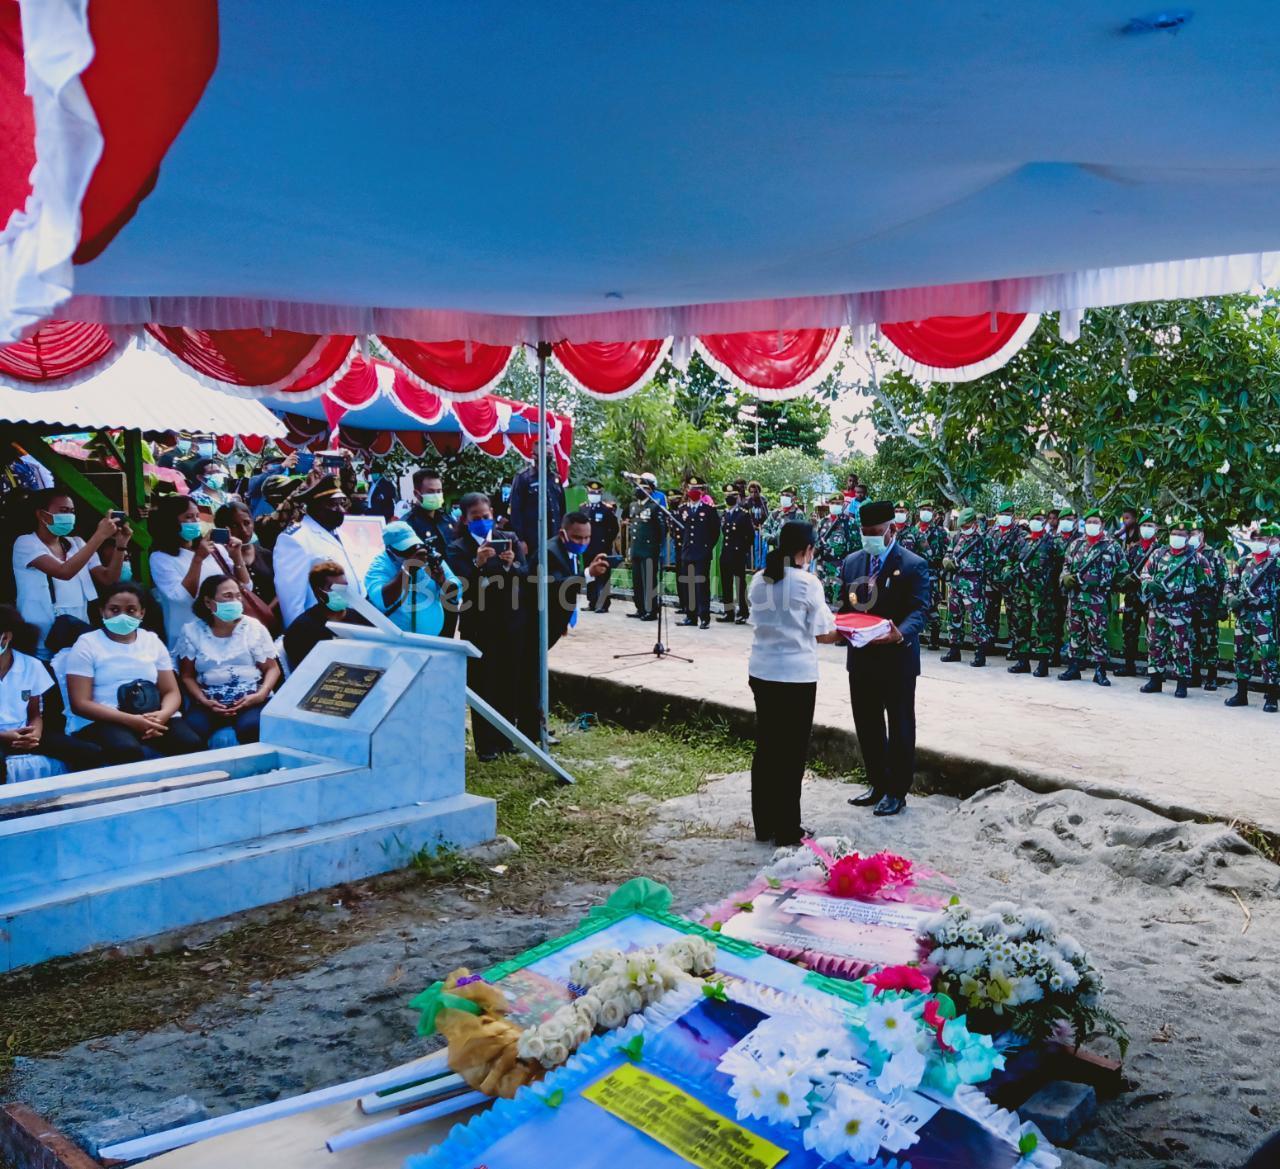 Gubernur PB, Pimpin Pemakaman Alm. Bupati Manokwari Demas Paulus Mandacan 24 IMG 20200423 WA0031